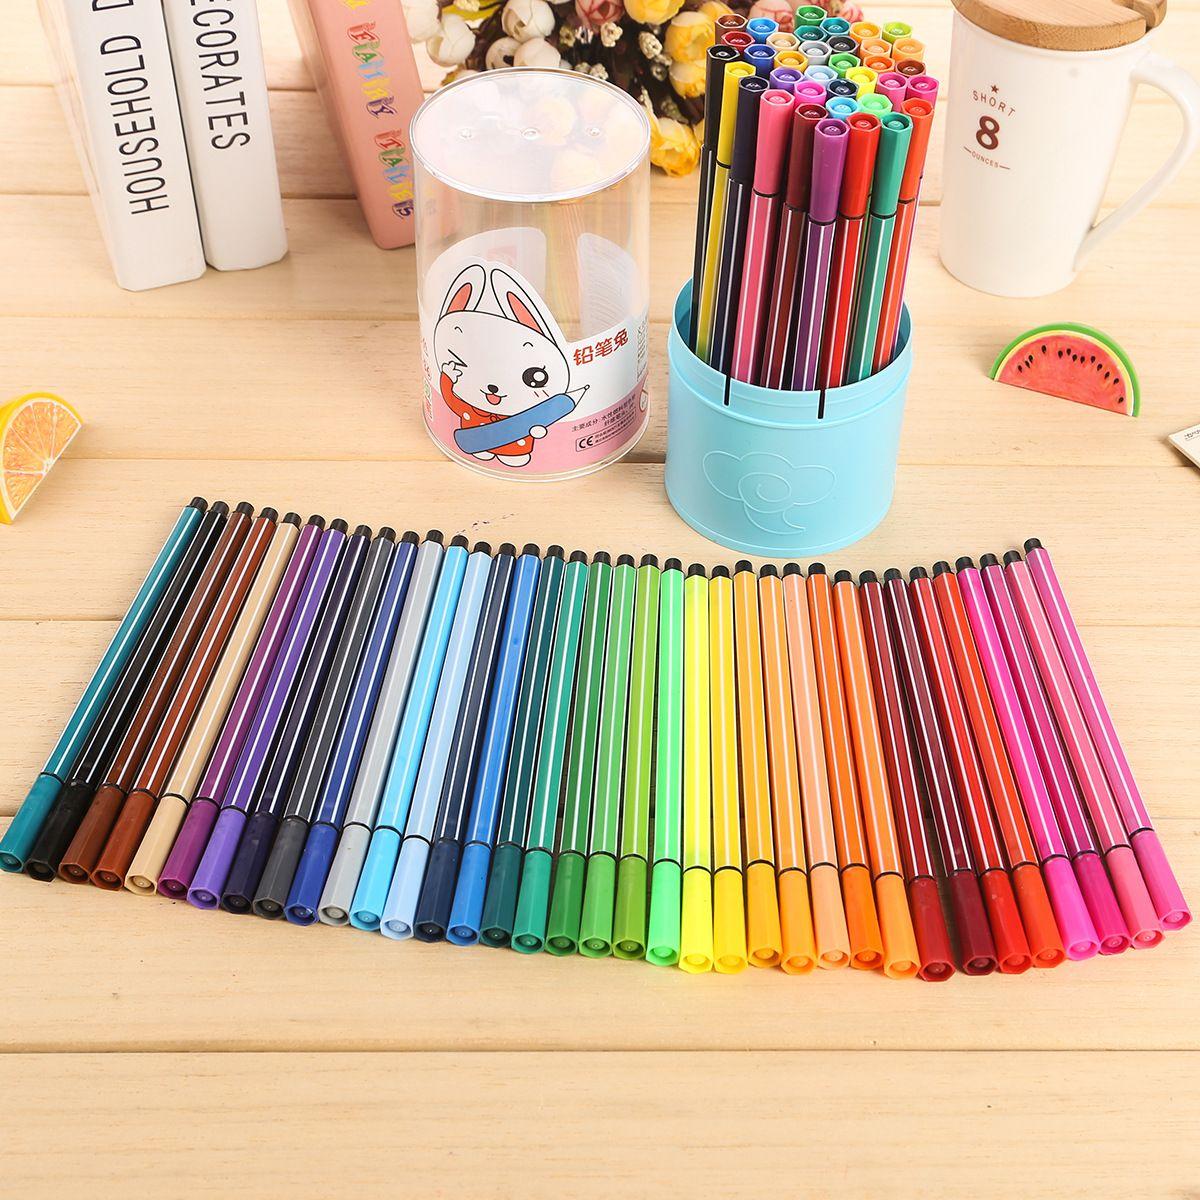 36 colorset can water wash watercolor pen children